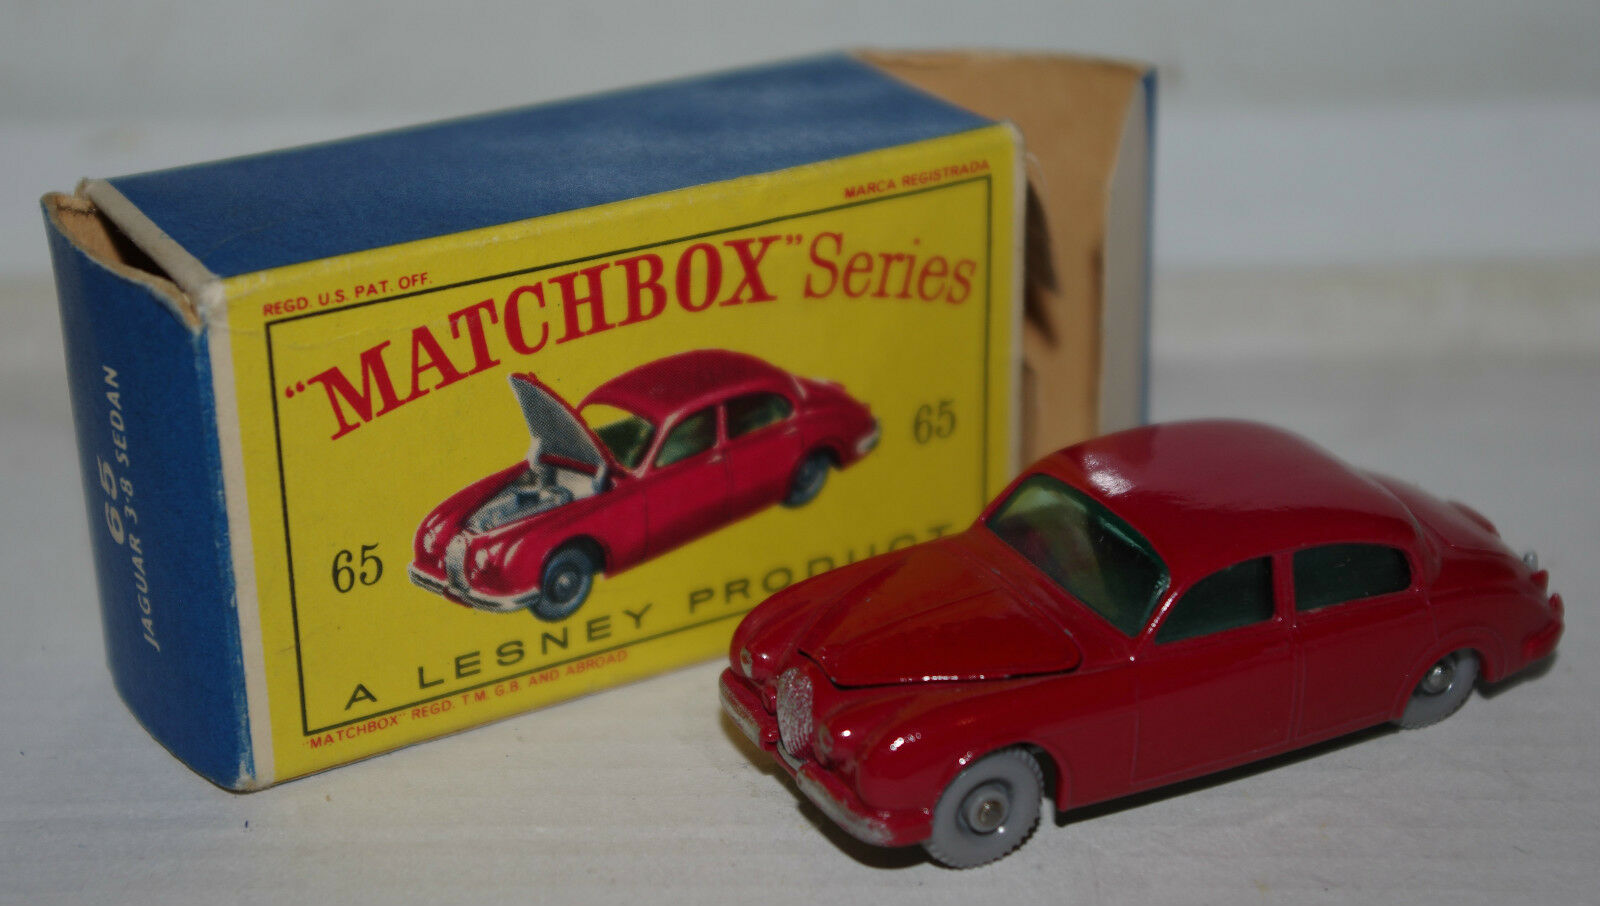 Matchbox lesney jaguar zahl box 65 toy cars   02